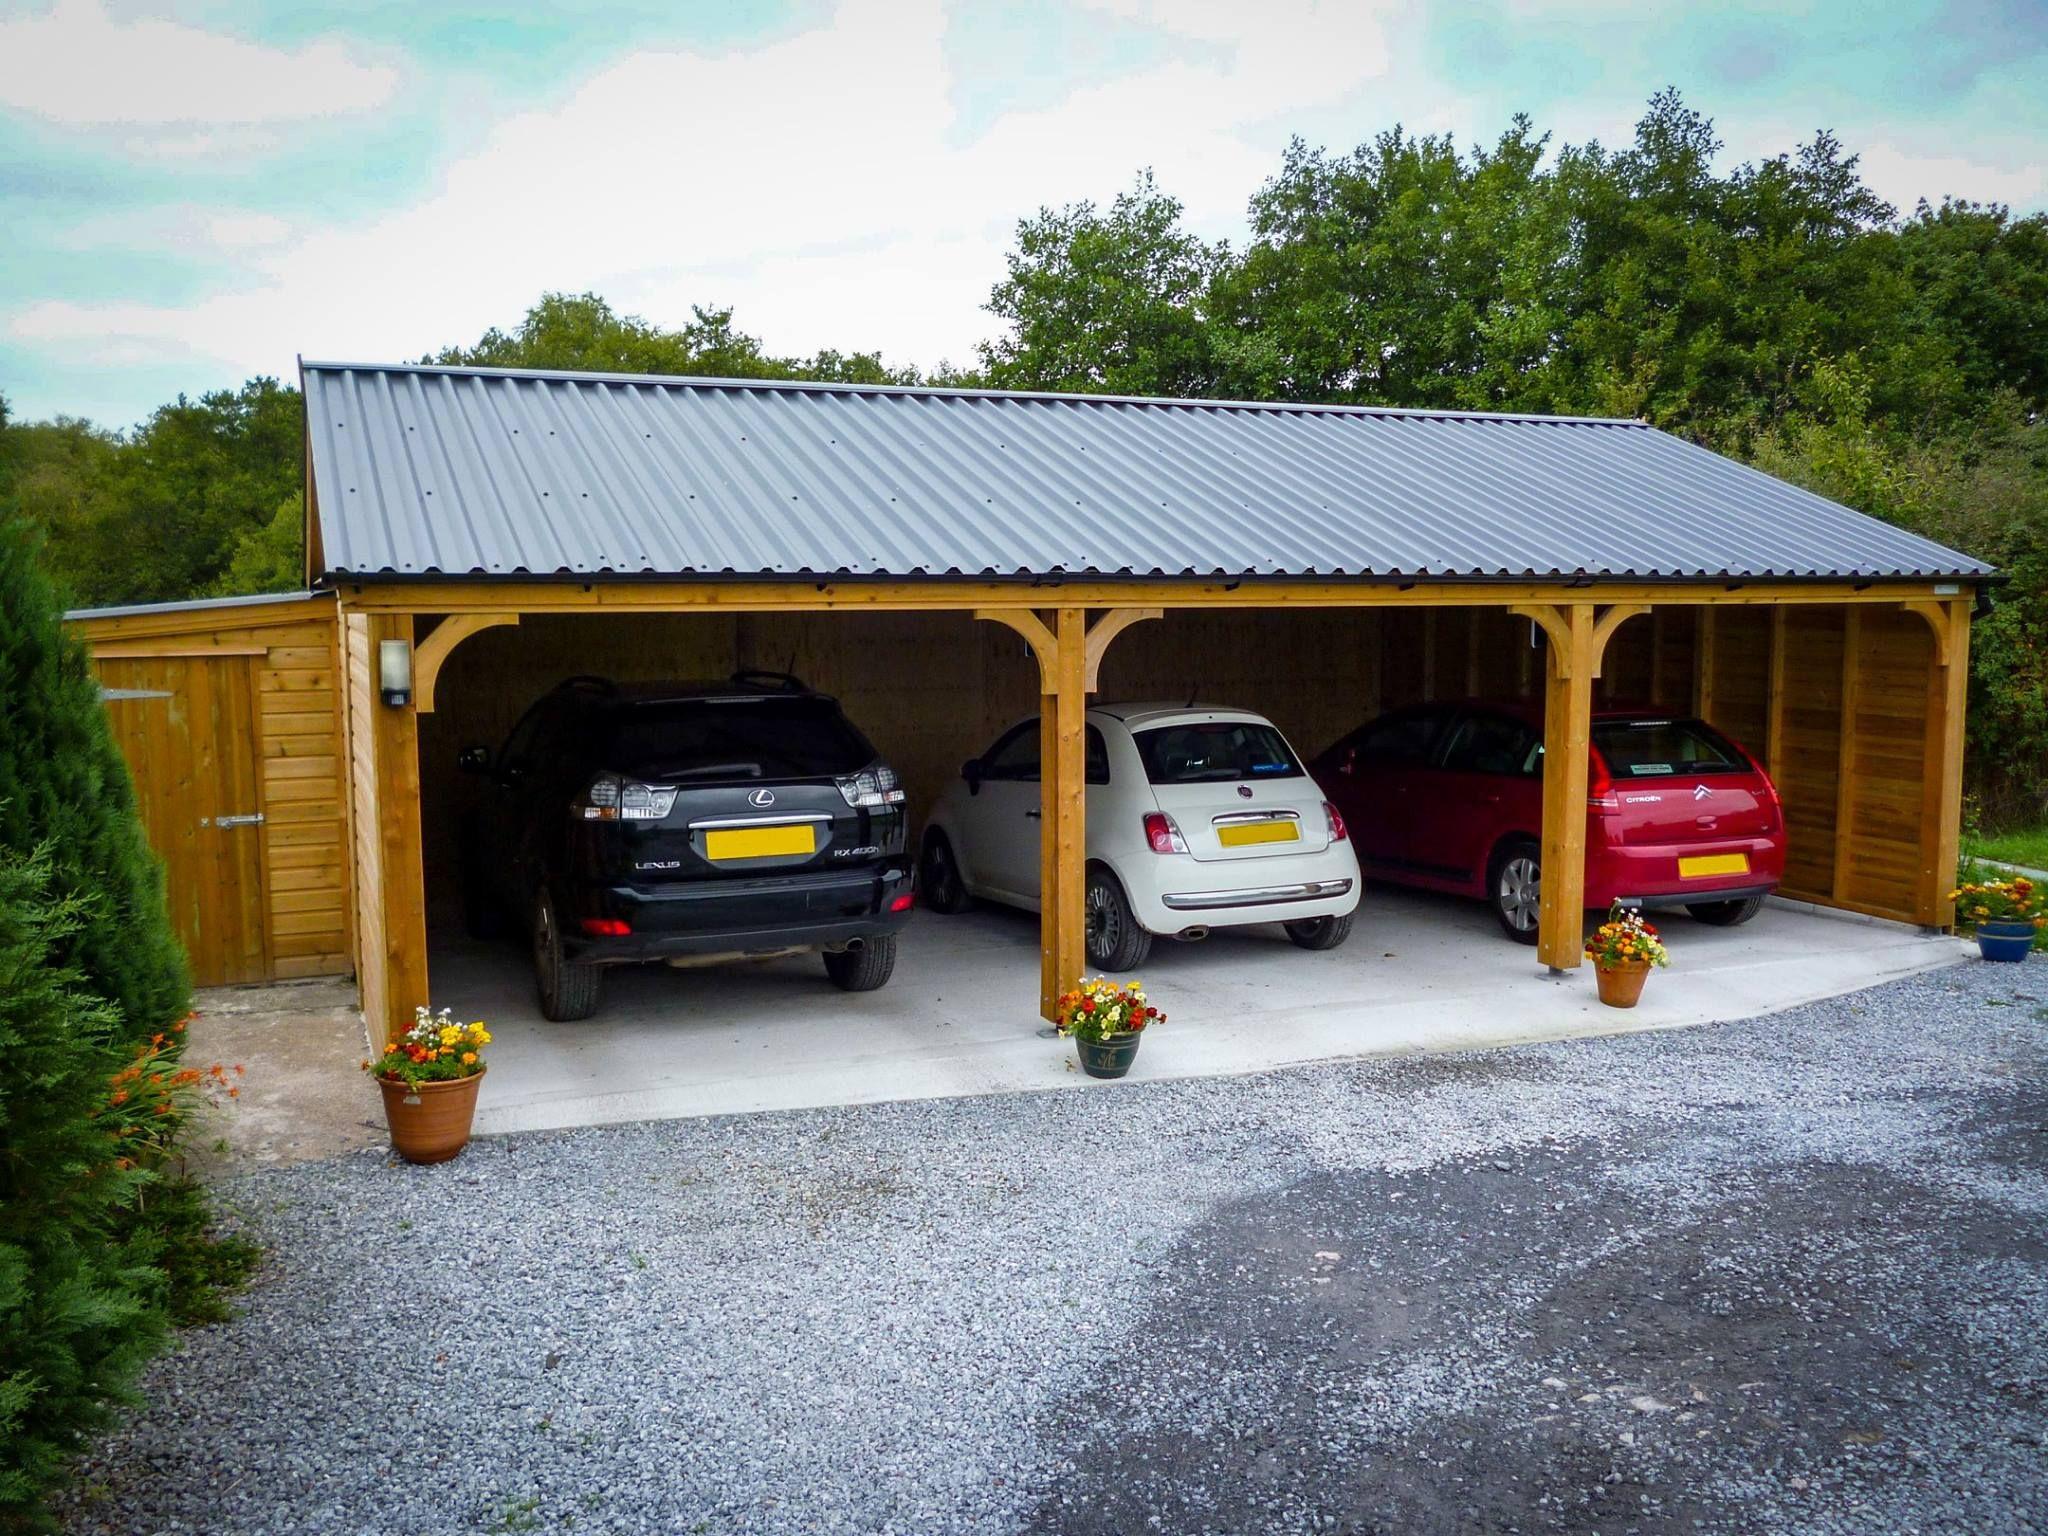 Cladco Profiles Roofing Sheets Box Profile Creates Carport Carport Carport Designs Wooden Carports